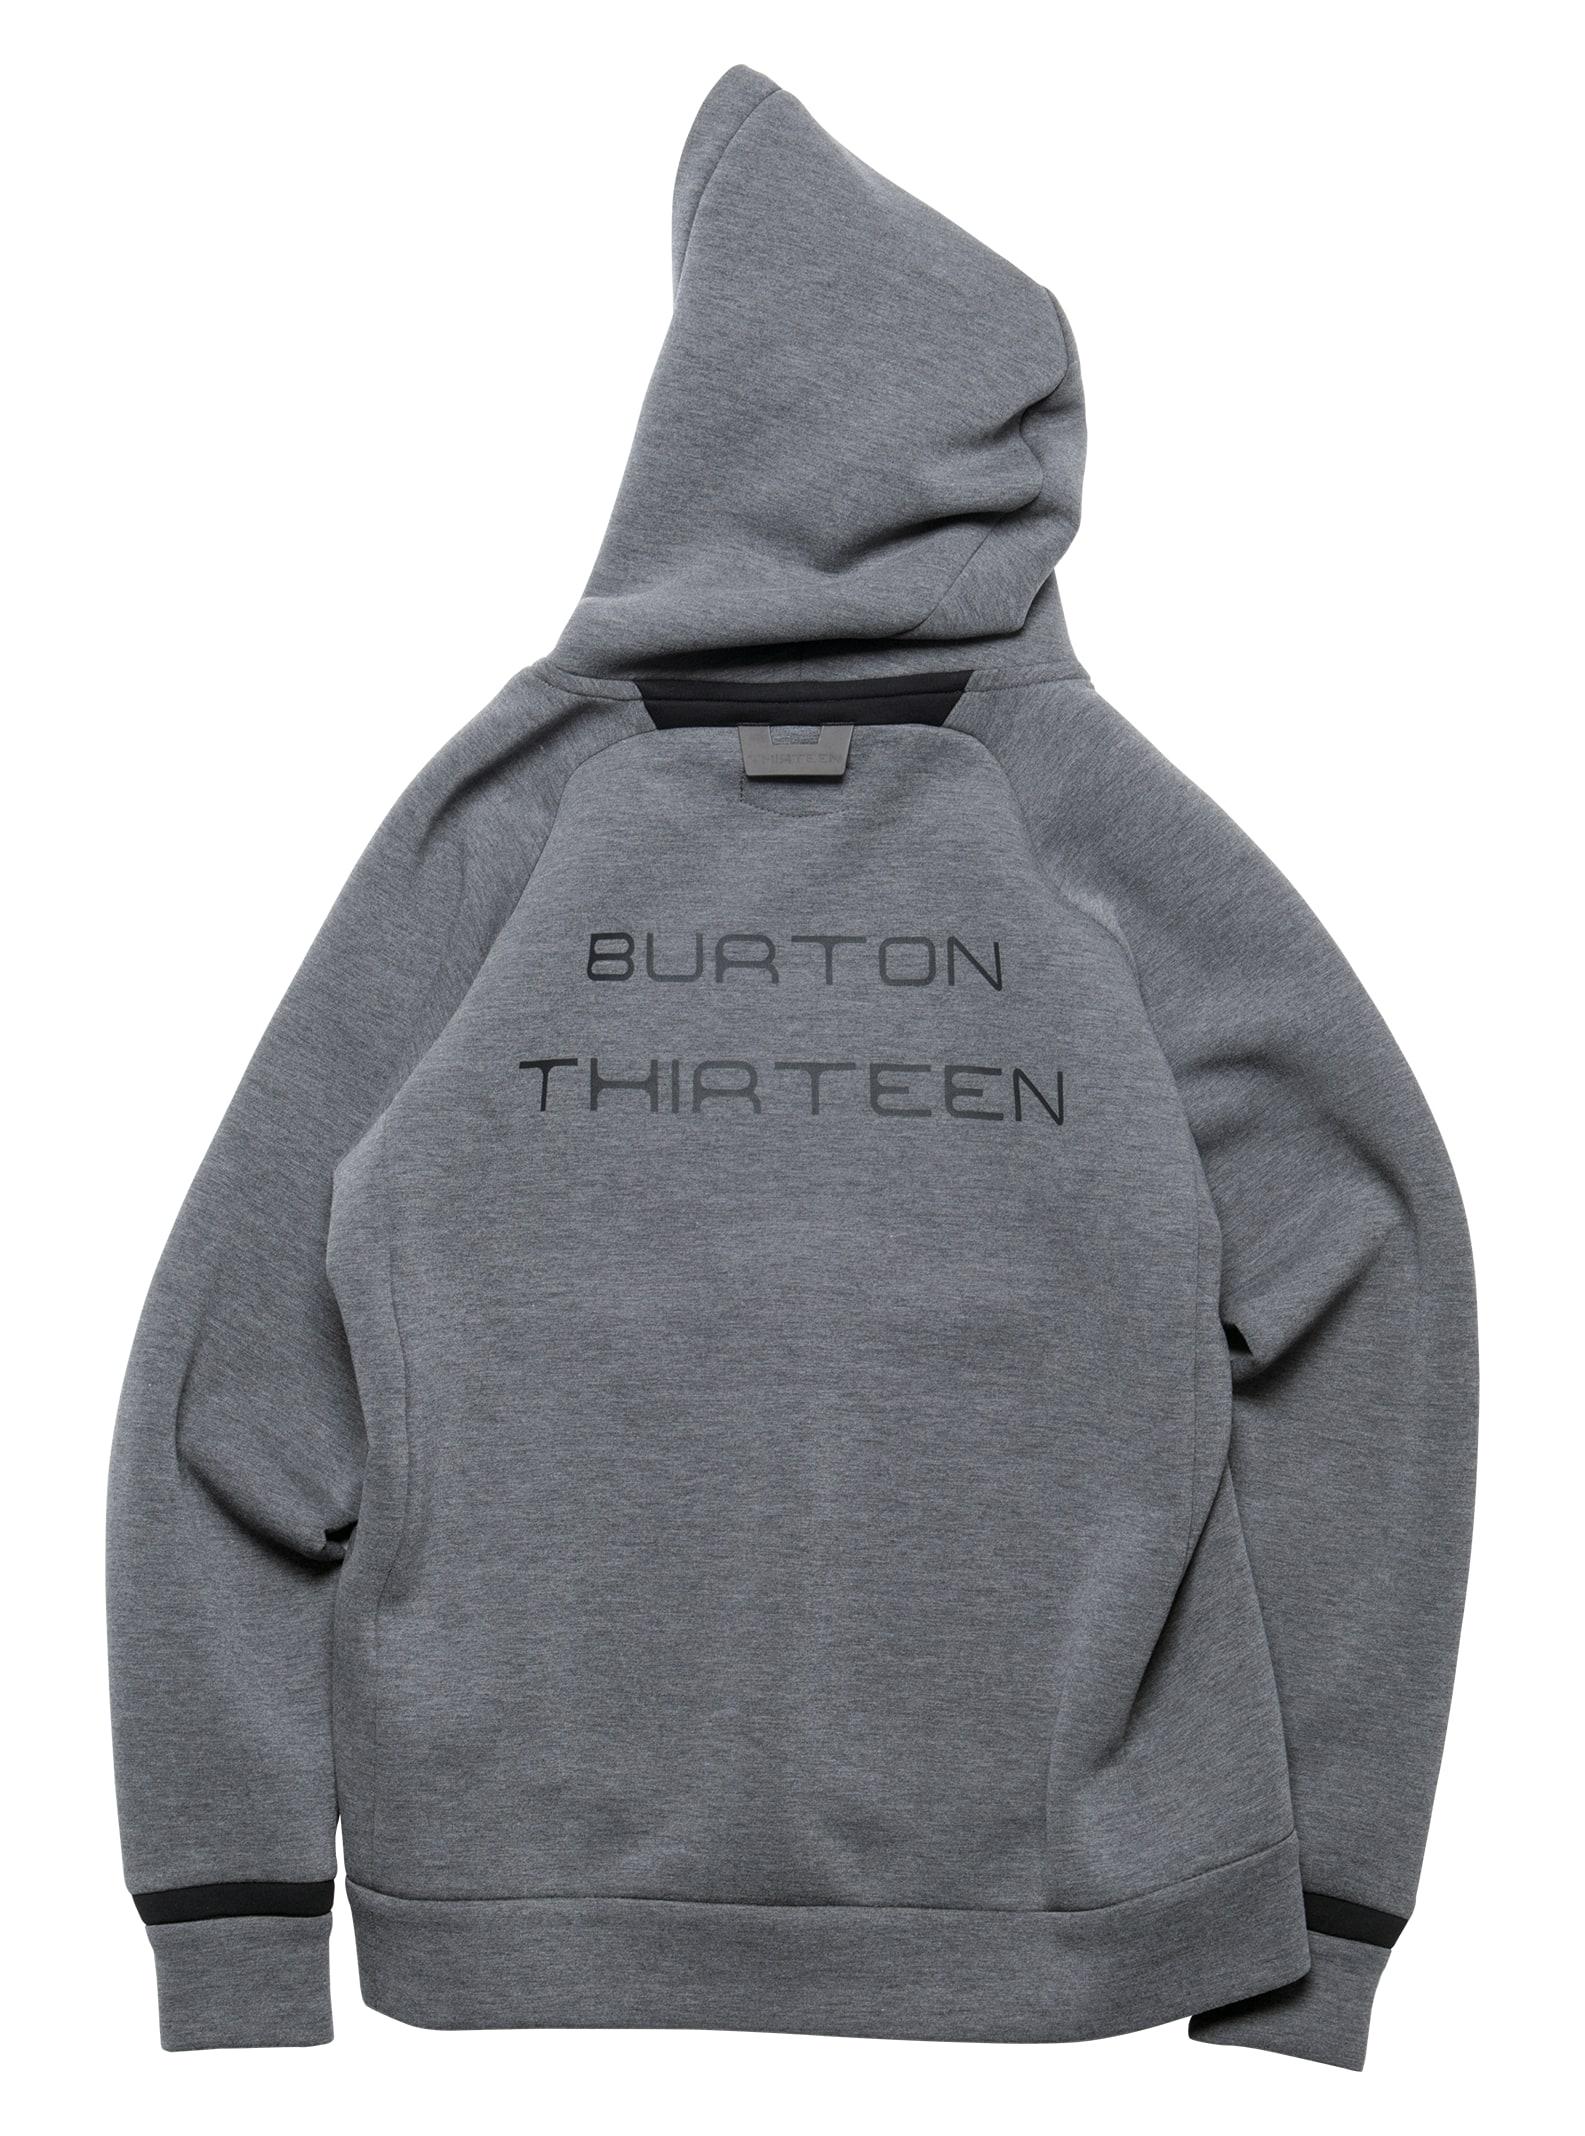 burton hoodie boys sleeper youtube pullover watch oak